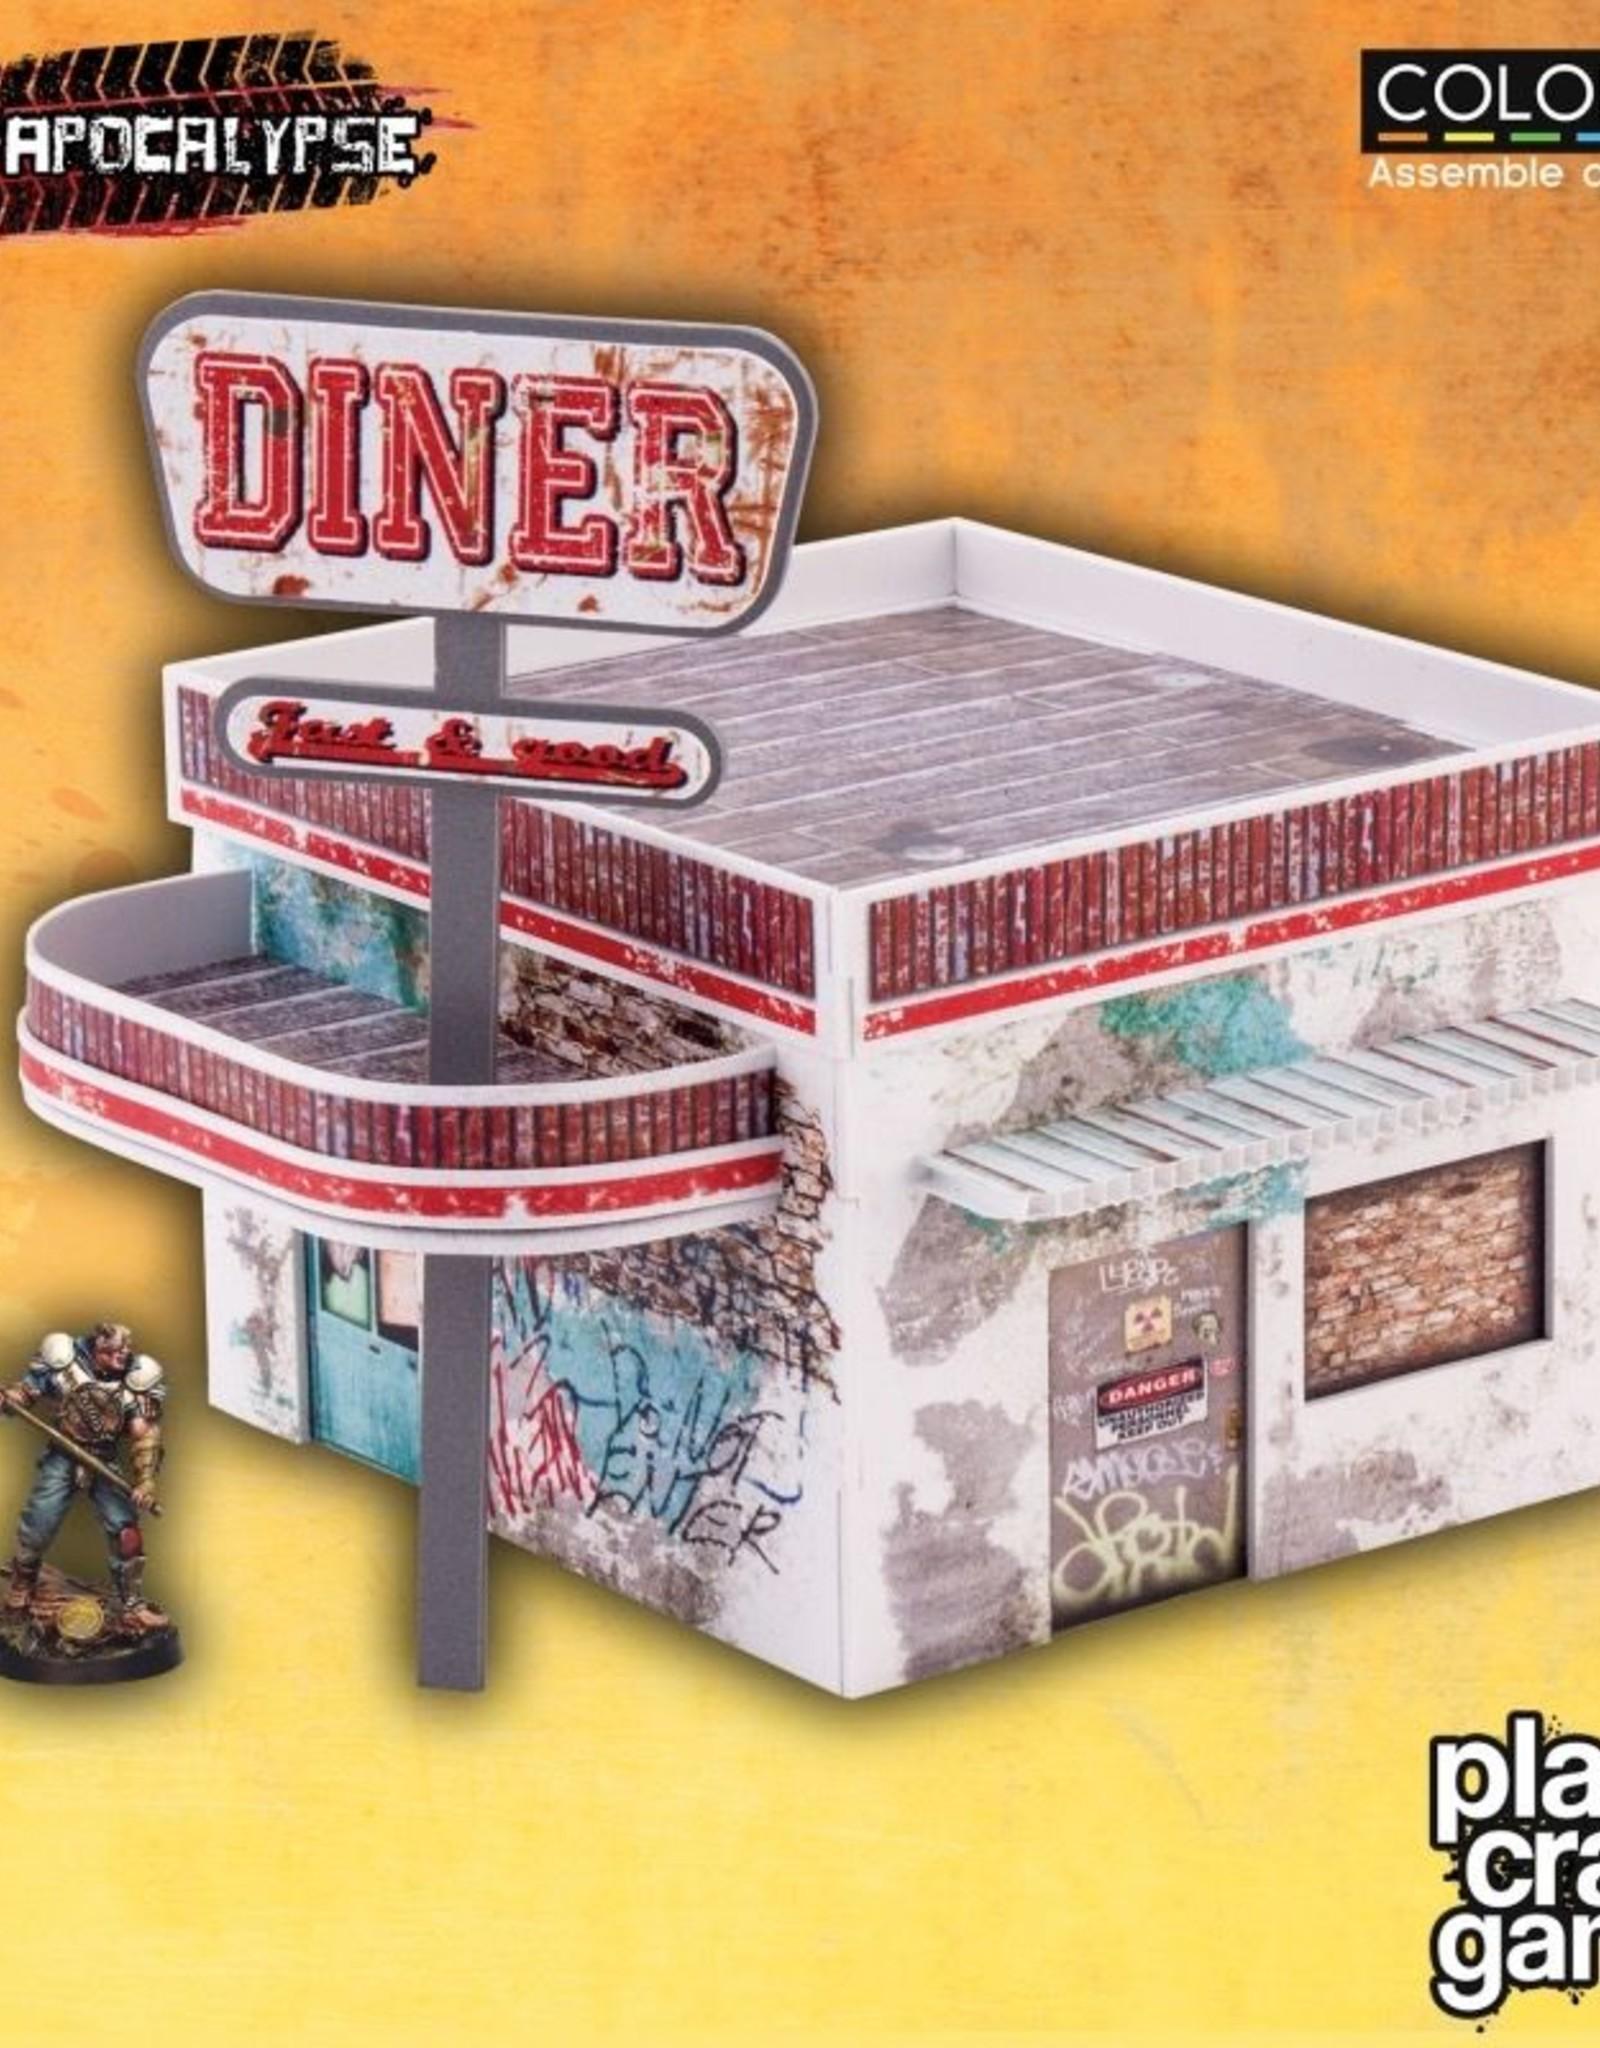 PCG - Scenery Plast Craft Games: Diner (pre-painted)